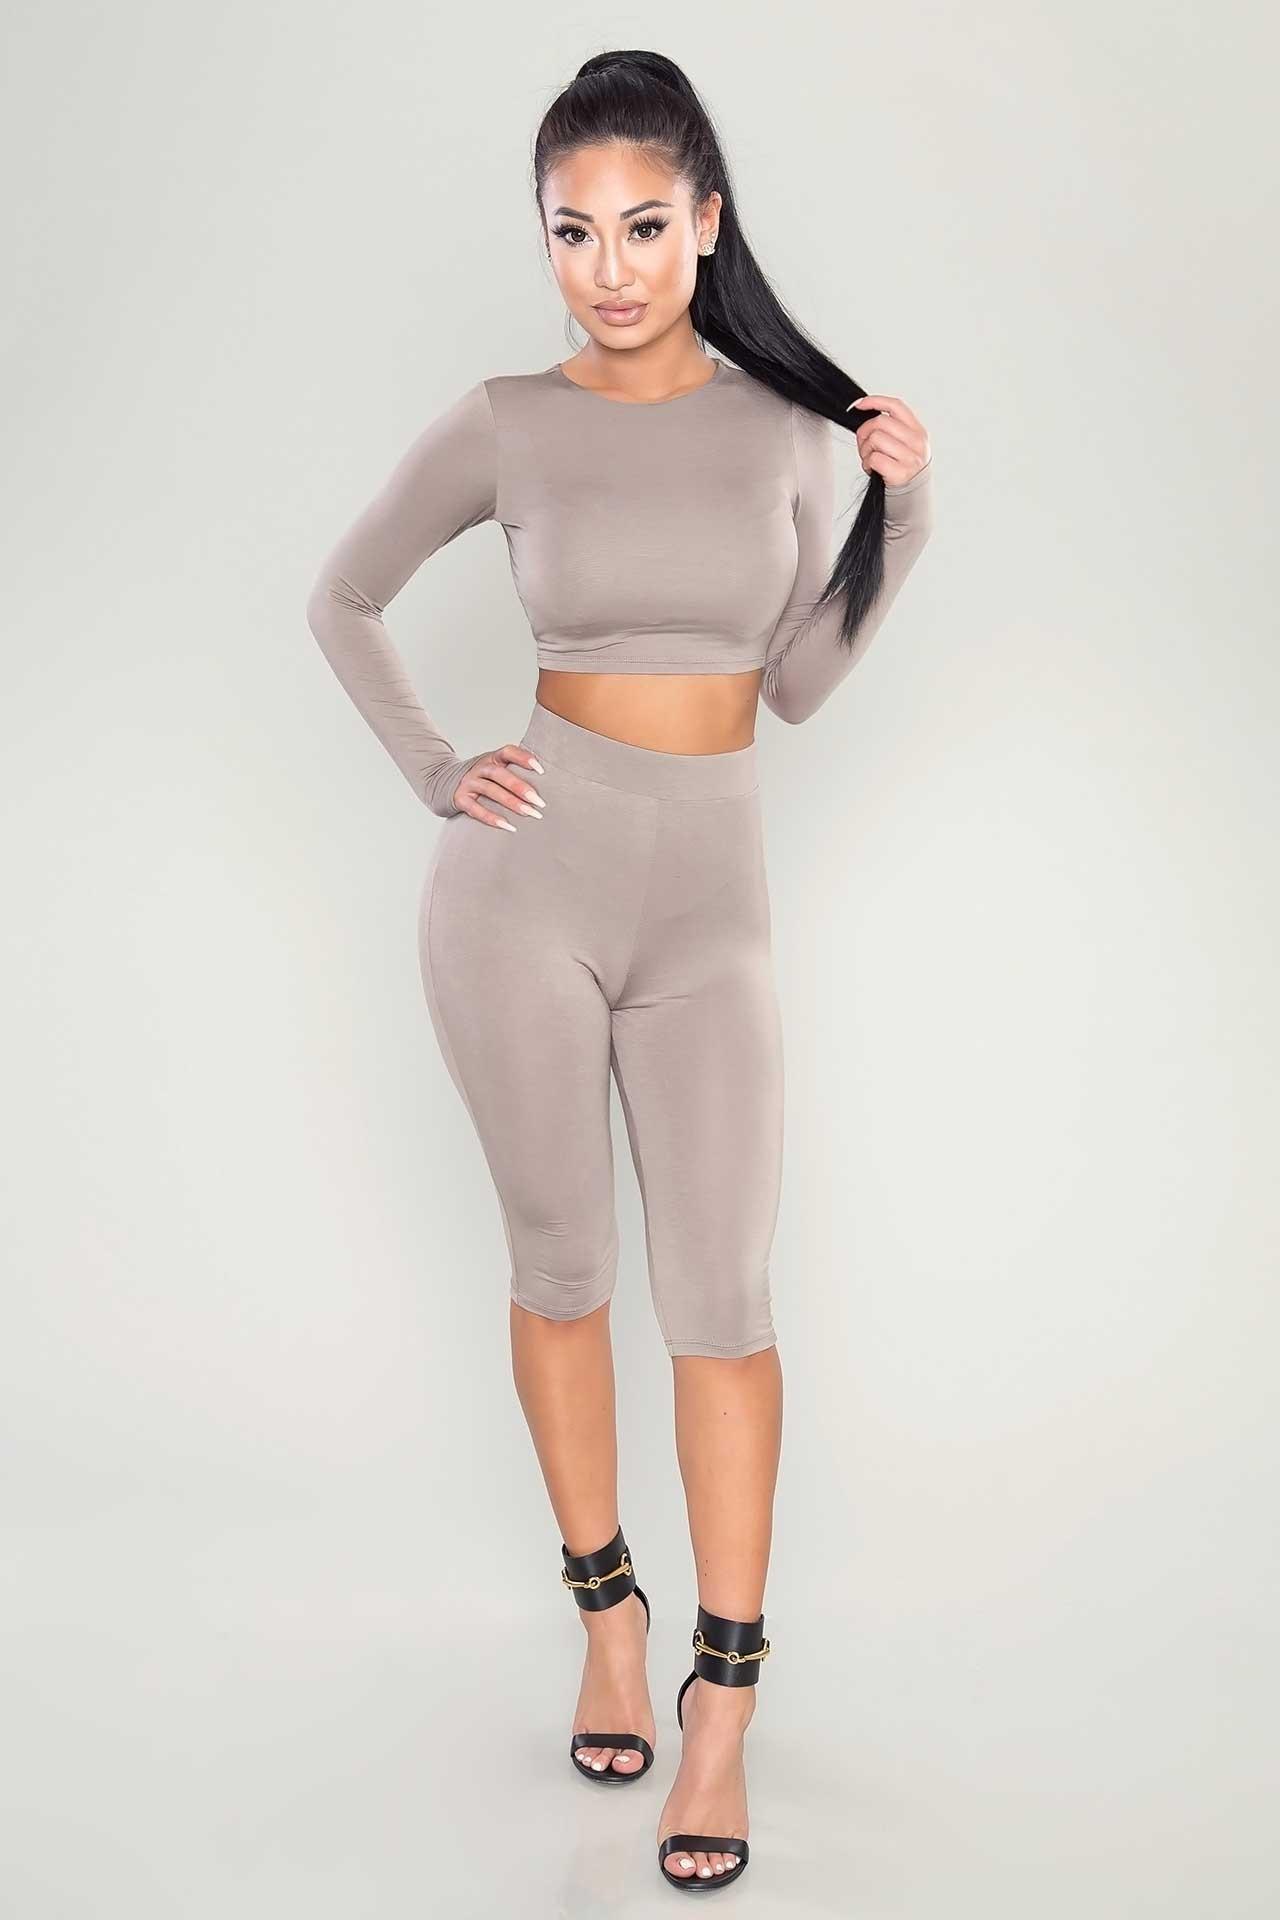 Women's Tracksuits T shirt+ pants women Sport suit Long sleeve crop tops and shorts set Color block women Bodycon Yoga sets